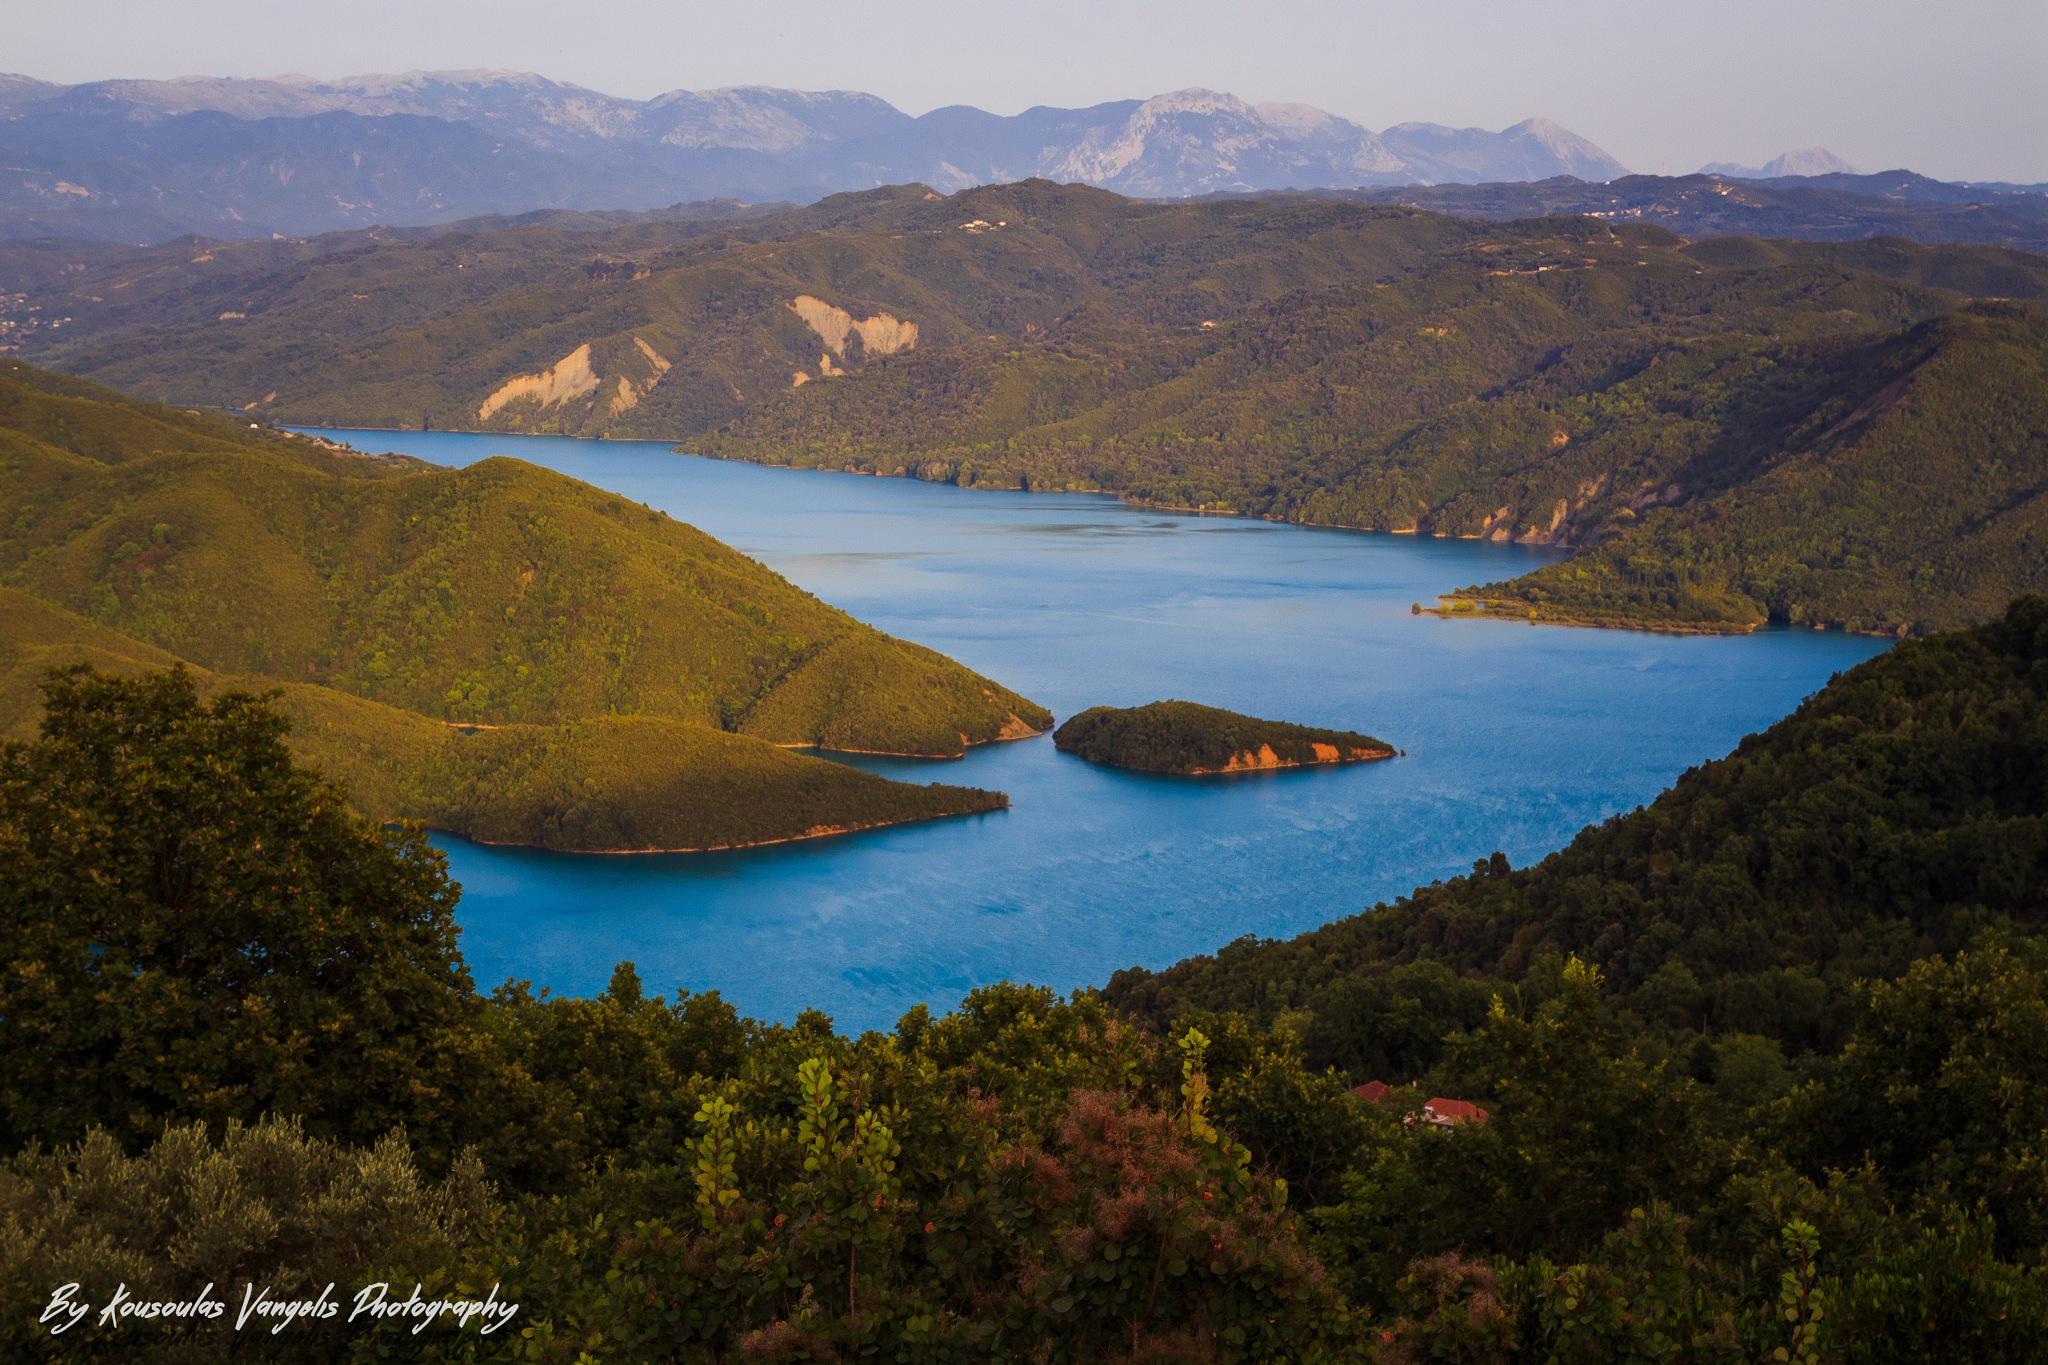 Lake dam pournari artas by kousoulas vangelis